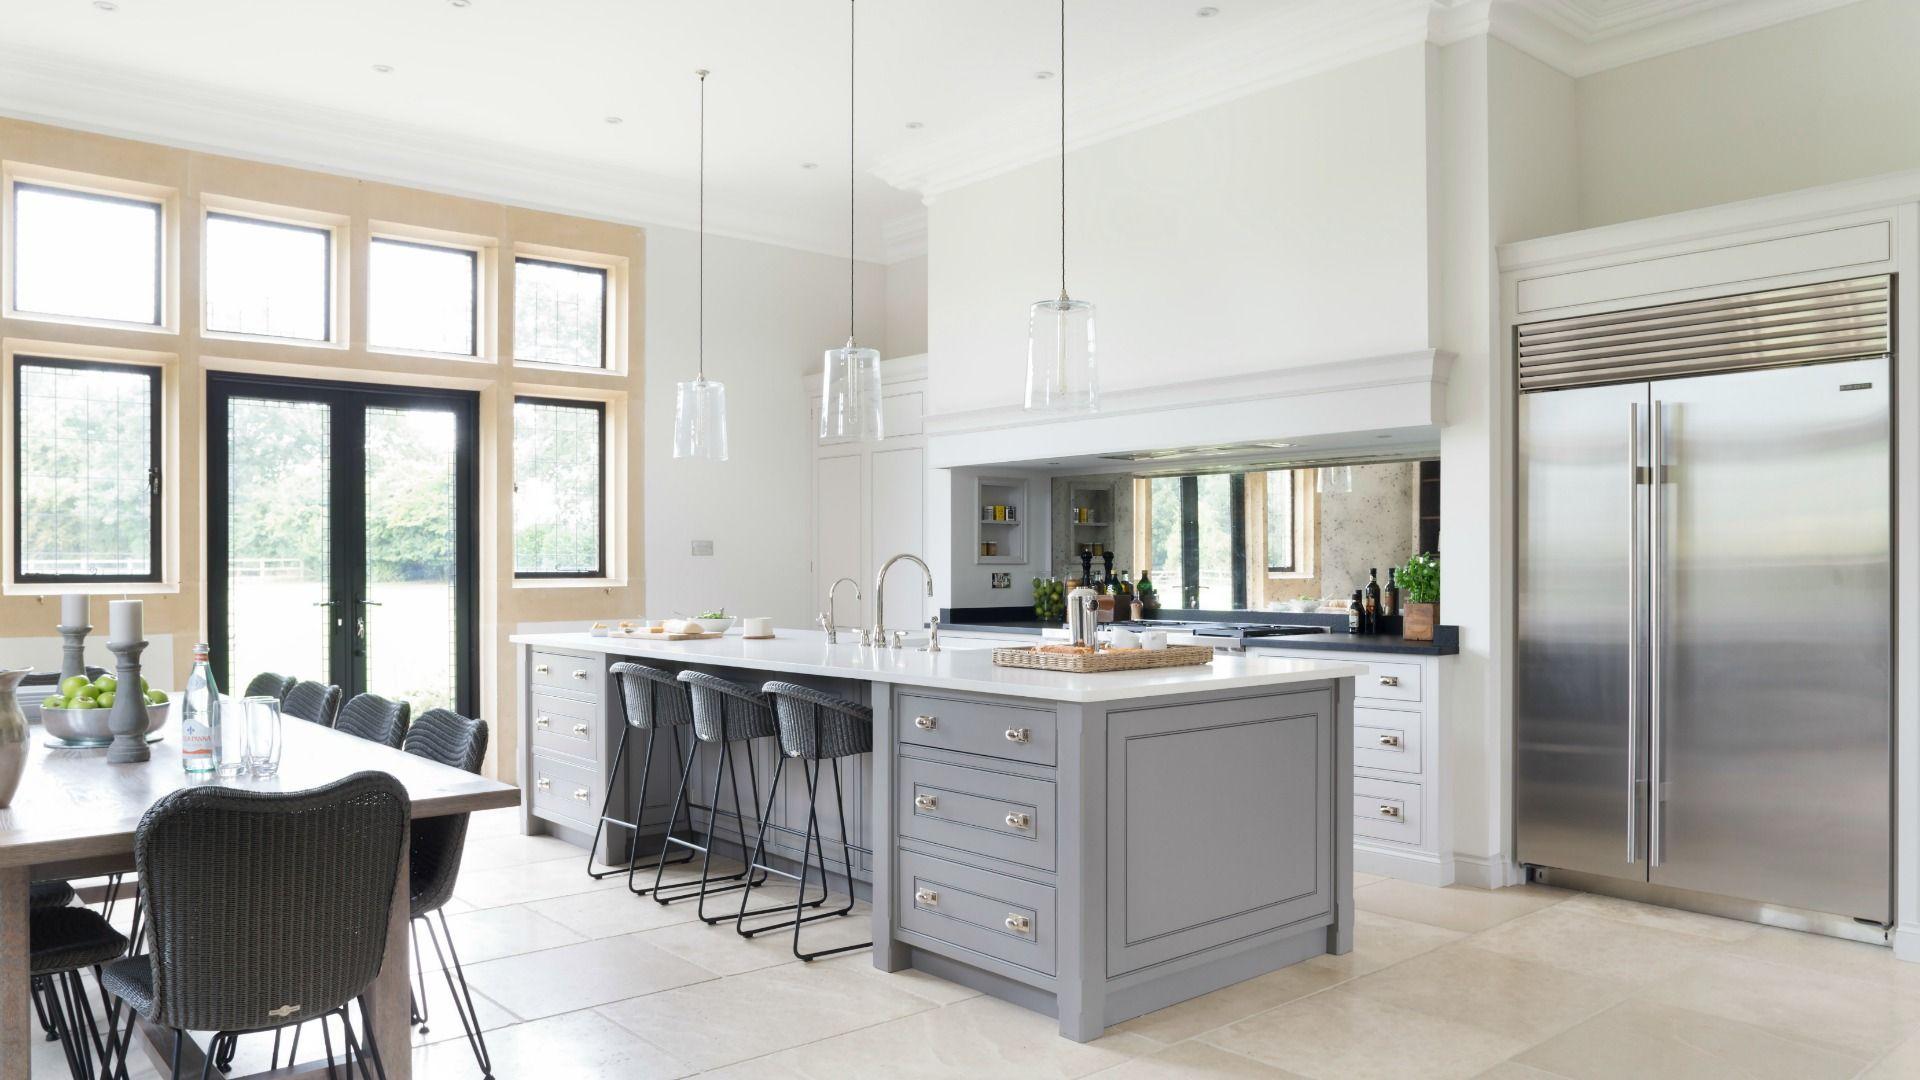 Luxury Bespoke Kitchen Design - Spenlow - Ascot - Humphrey Munson ...